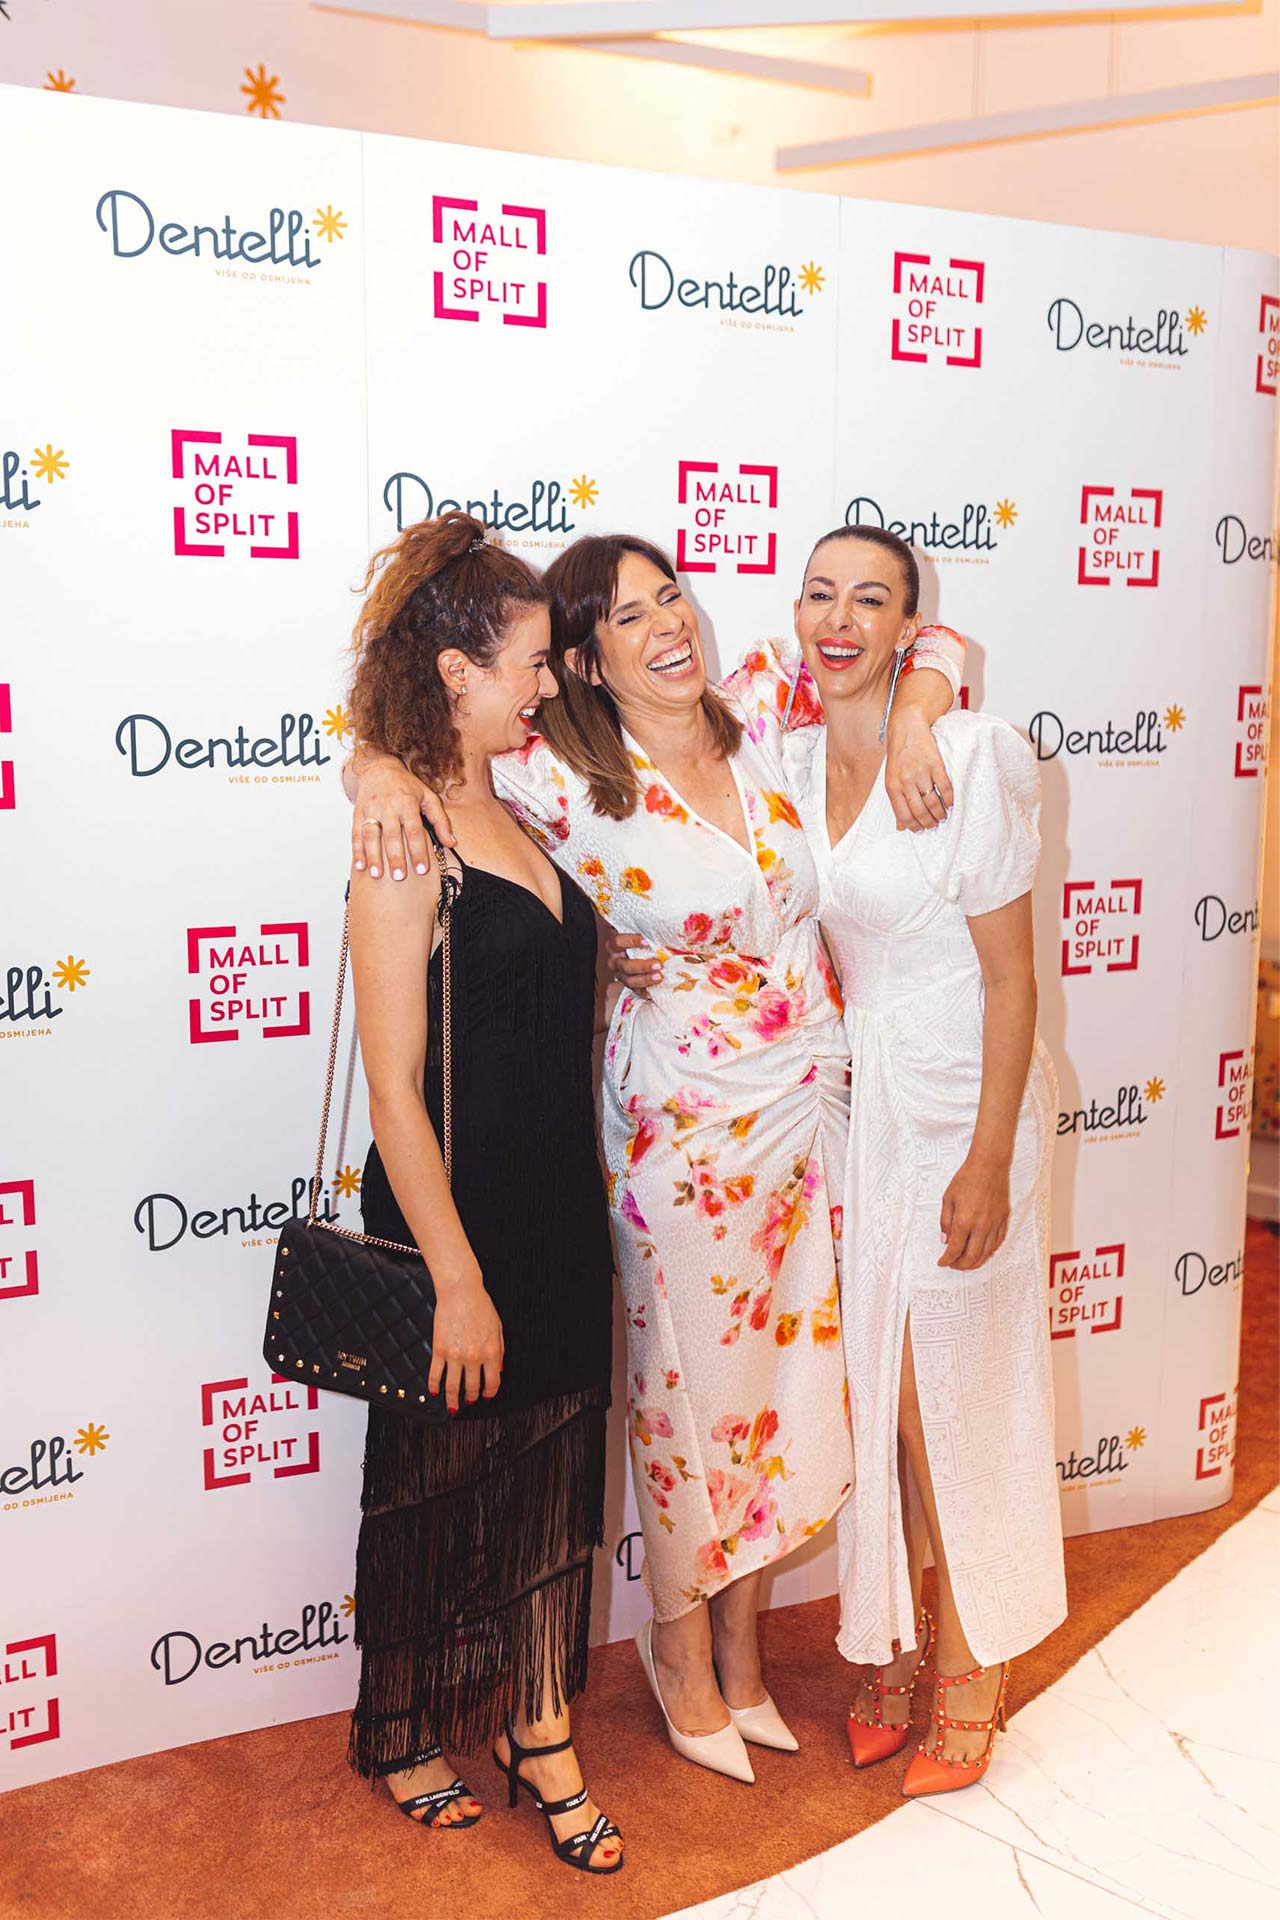 Dentelli Fashion Show - Wall of Fame (9)